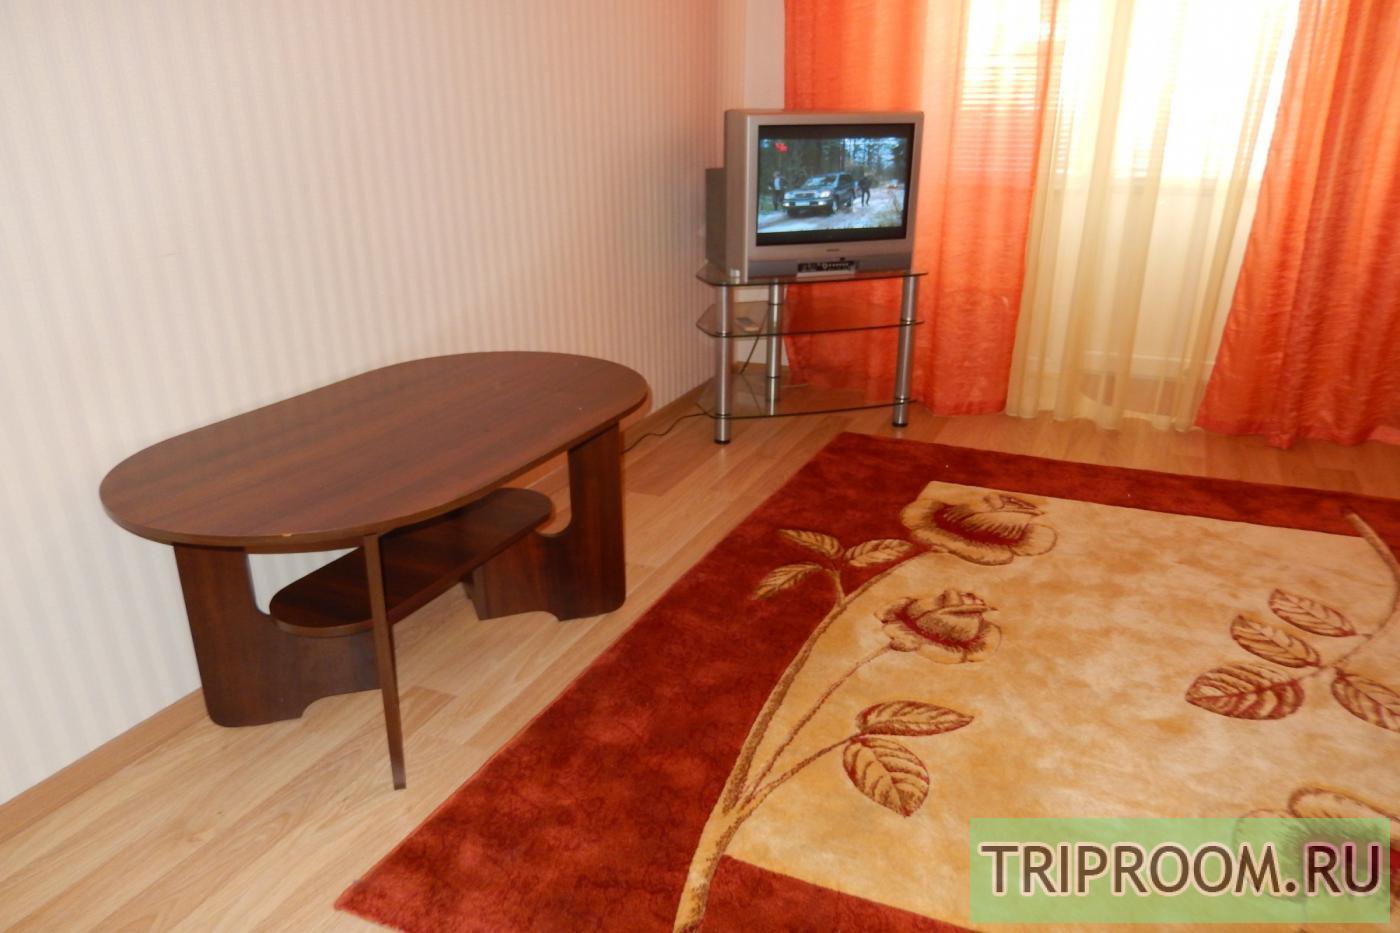 2-комнатная квартира посуточно (вариант № 21949), ул. Очаковцев улица, фото № 4